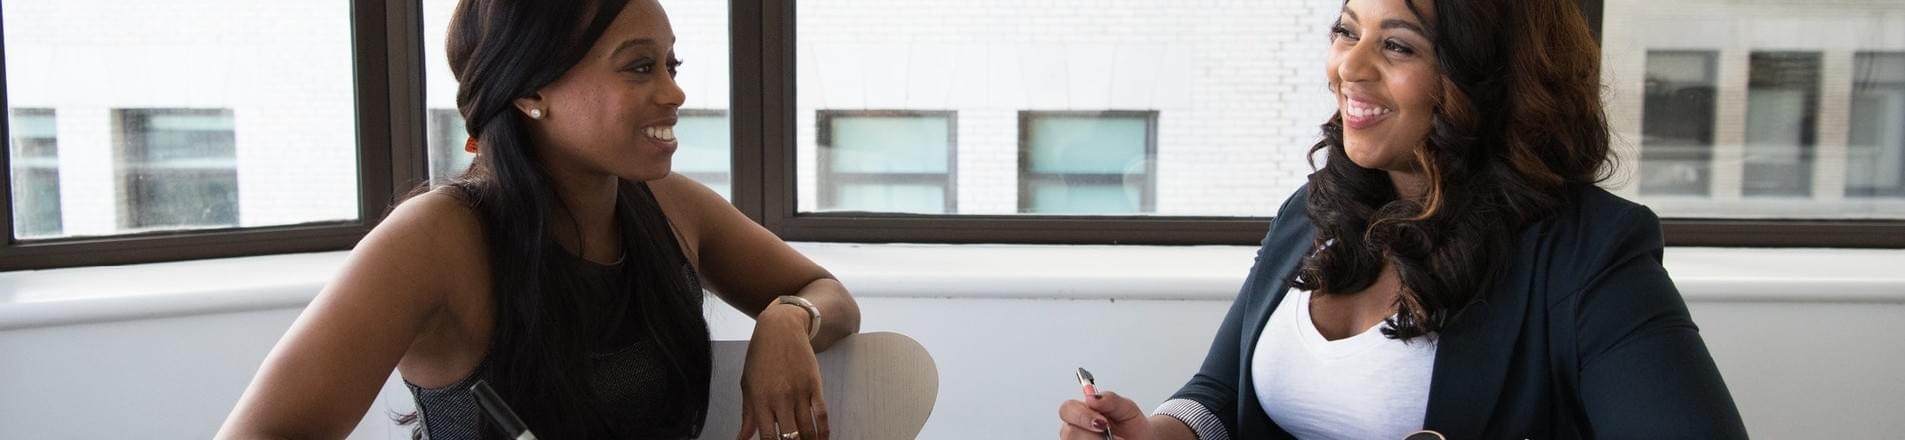 UK study finds only 17 black female professors